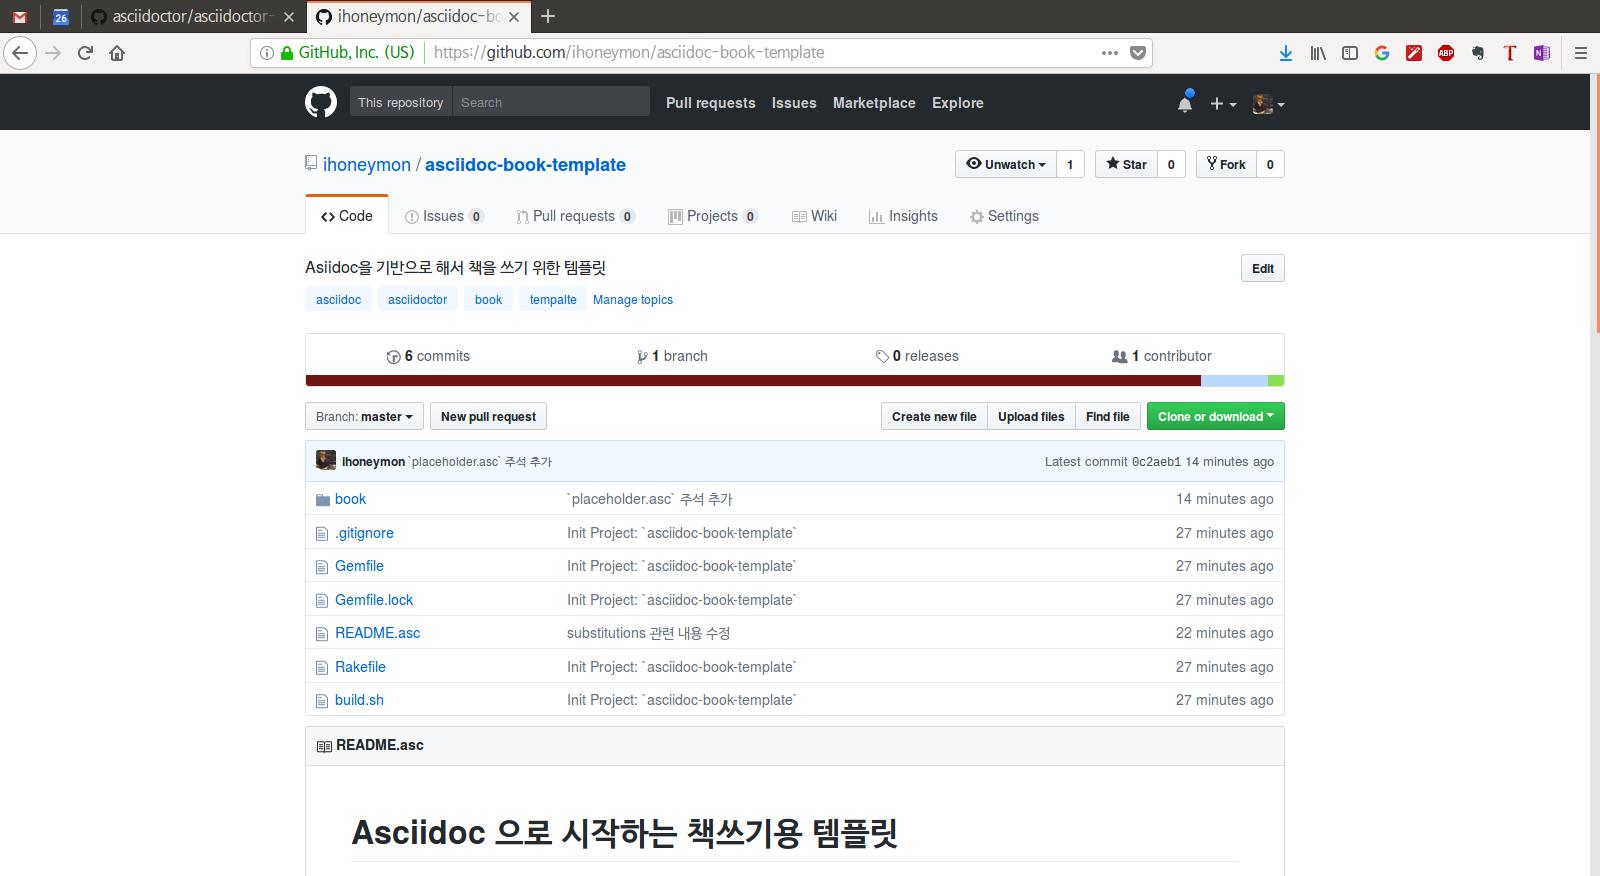 Project: asciidoc-book-template